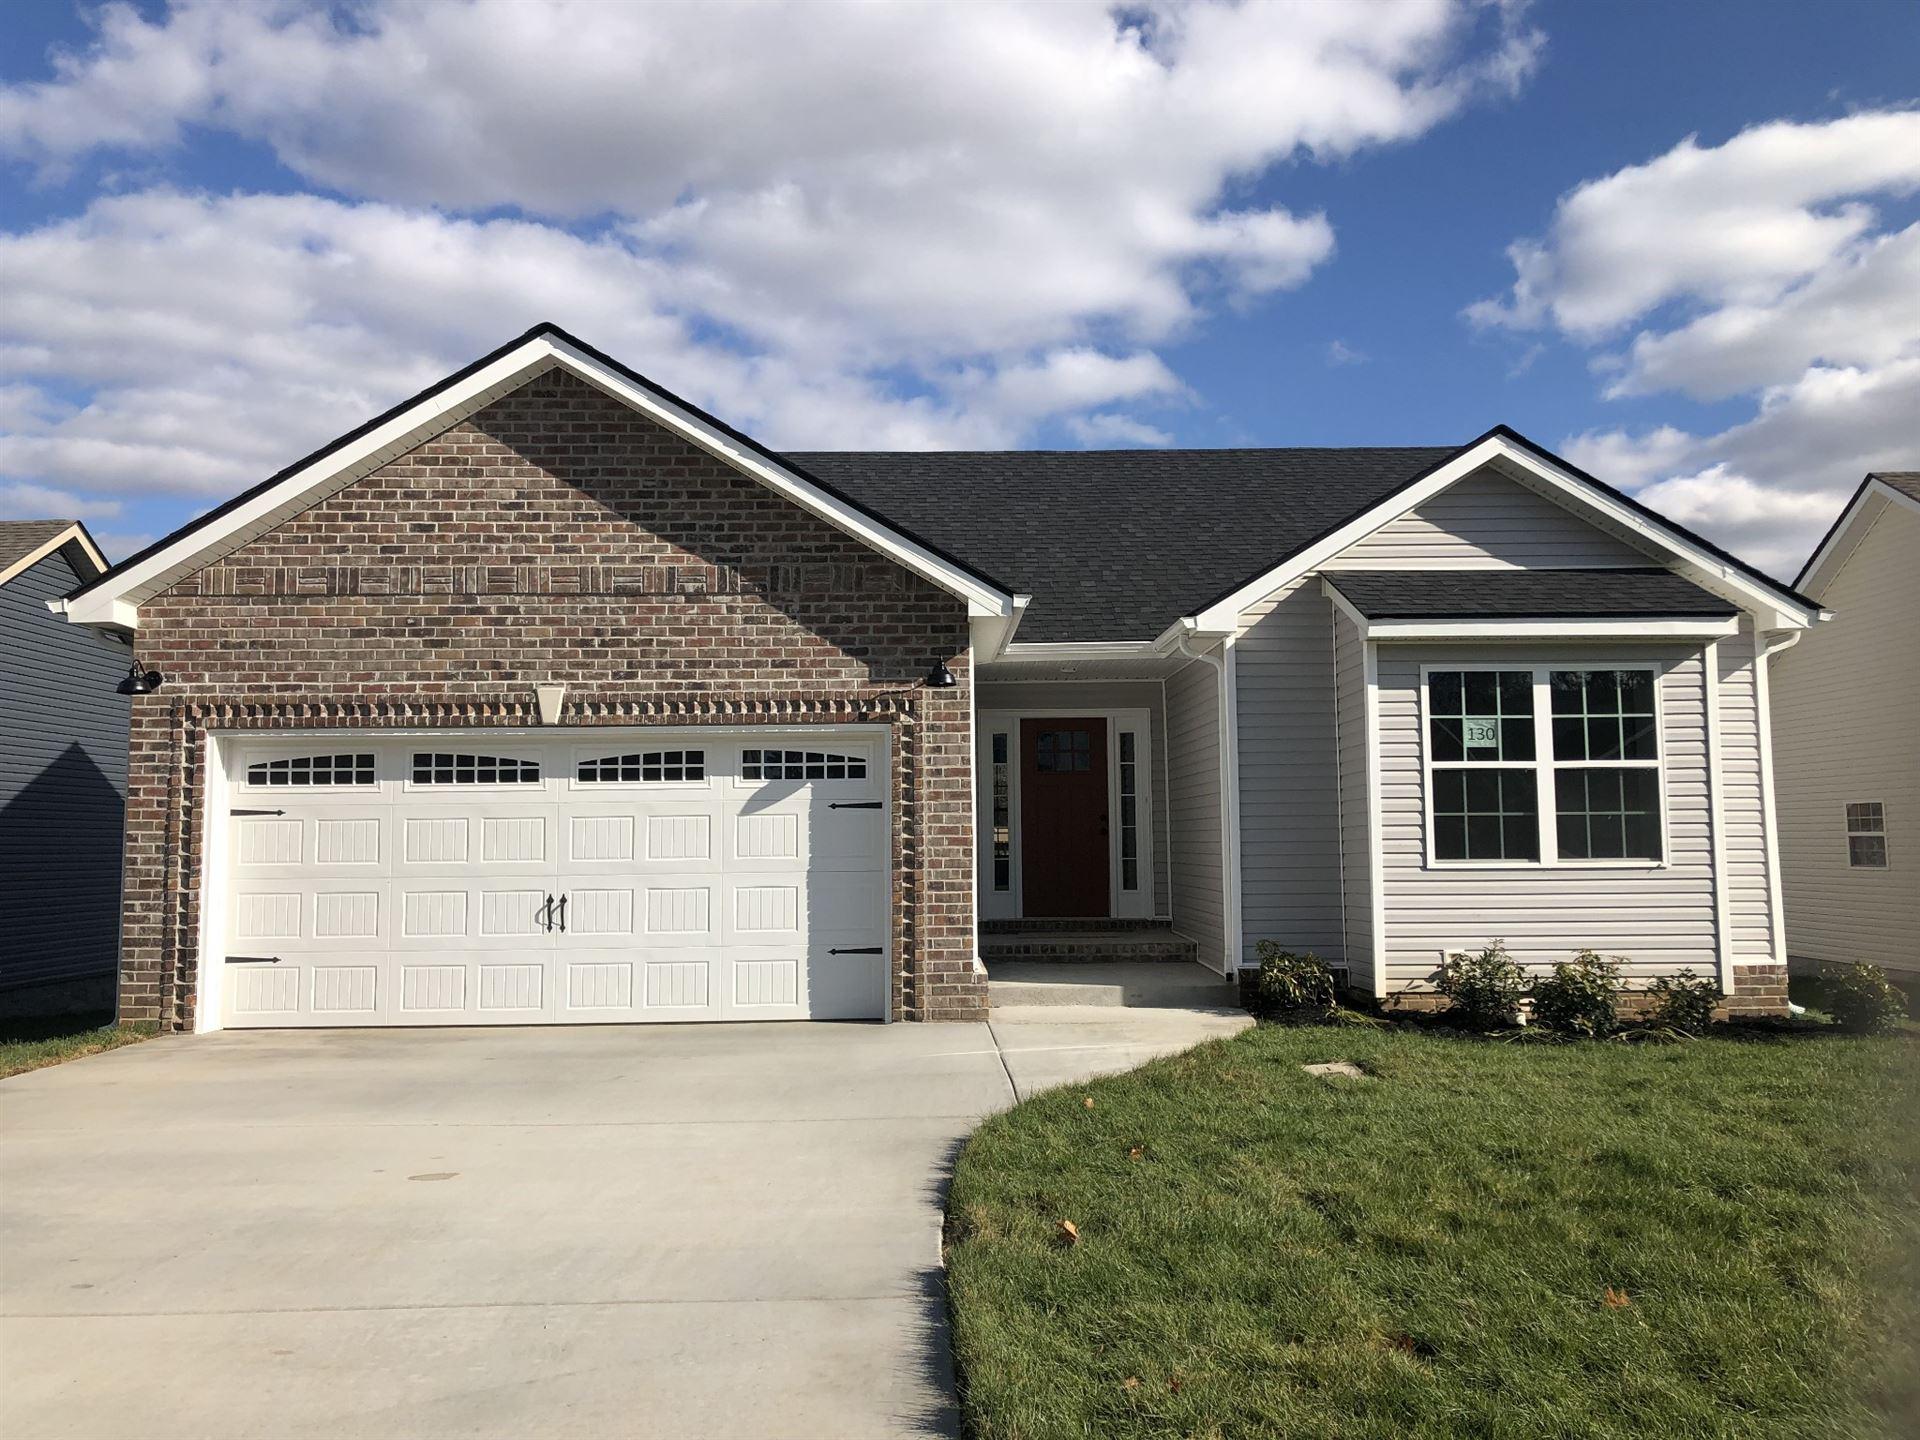 130 Irish Hills, Clarksville, TN 37042 - MLS#: 2292515